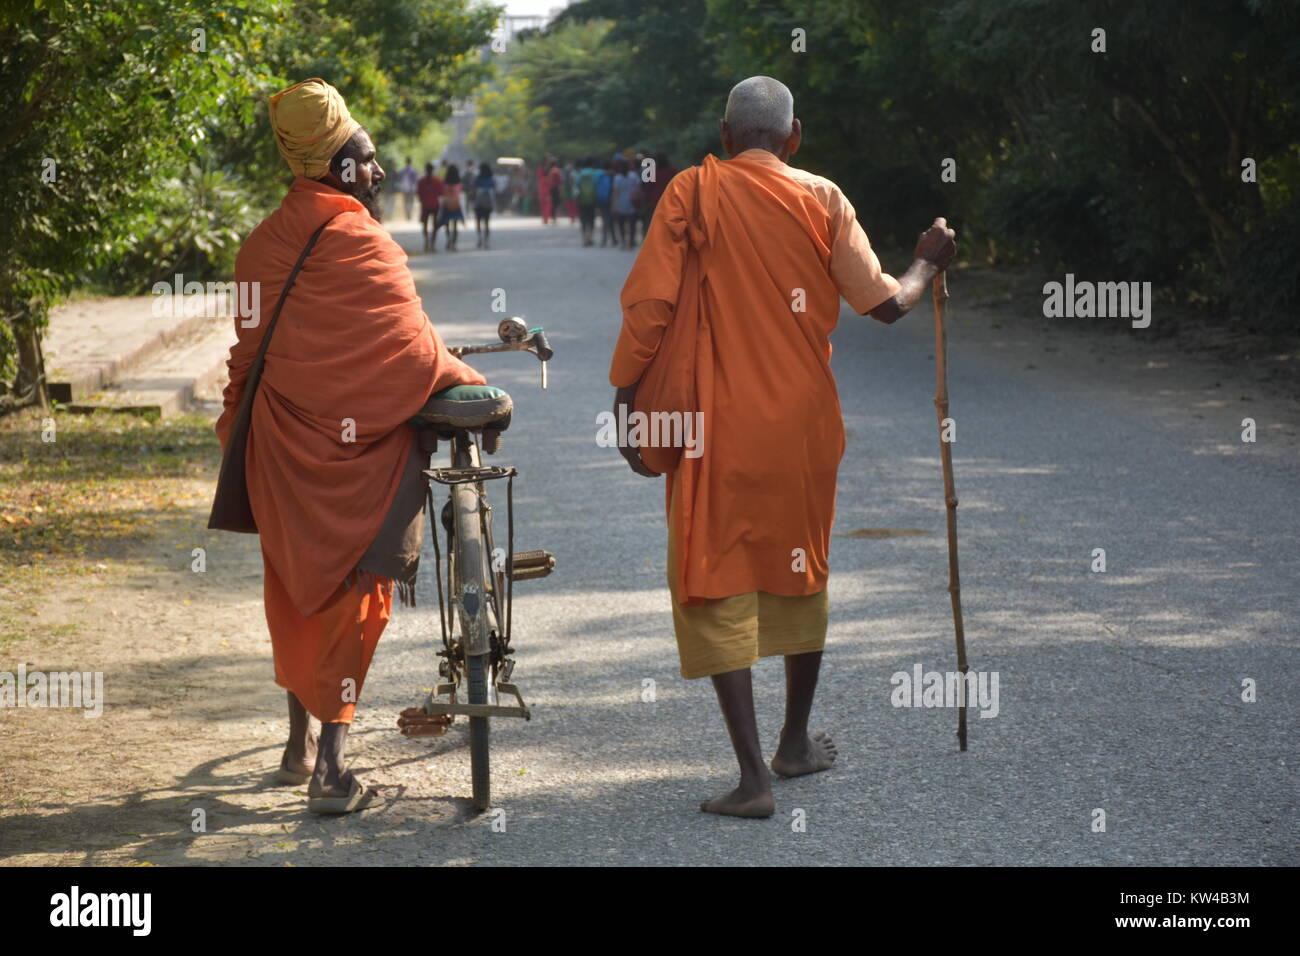 Two Elderly Monks walking on the street - Stock Image